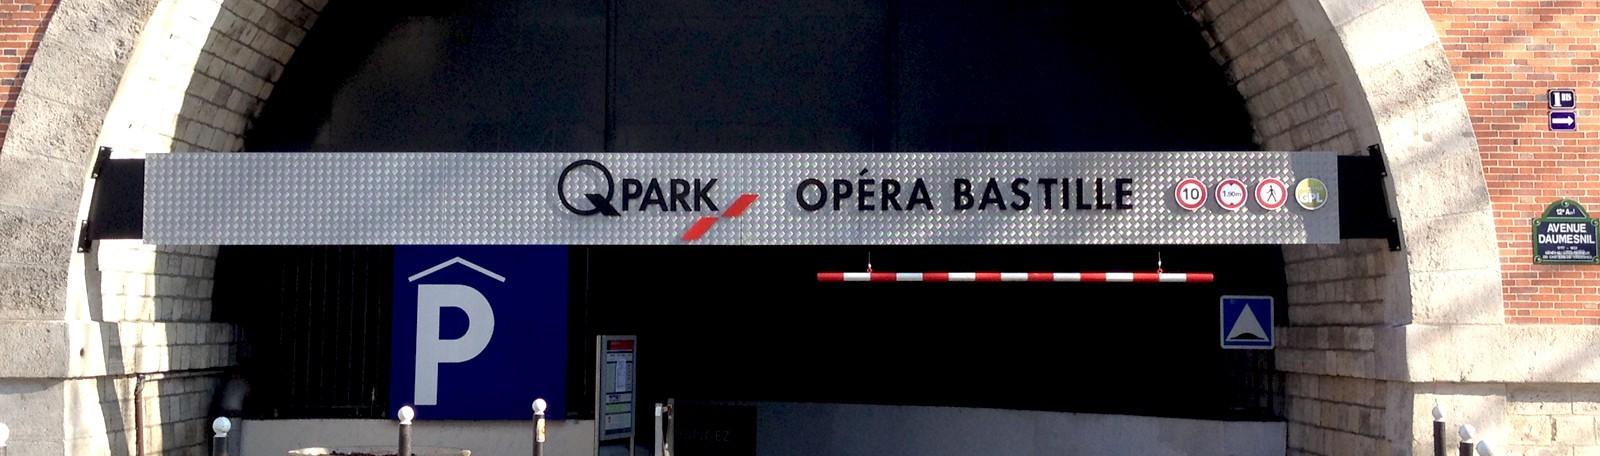 parking vinci opera